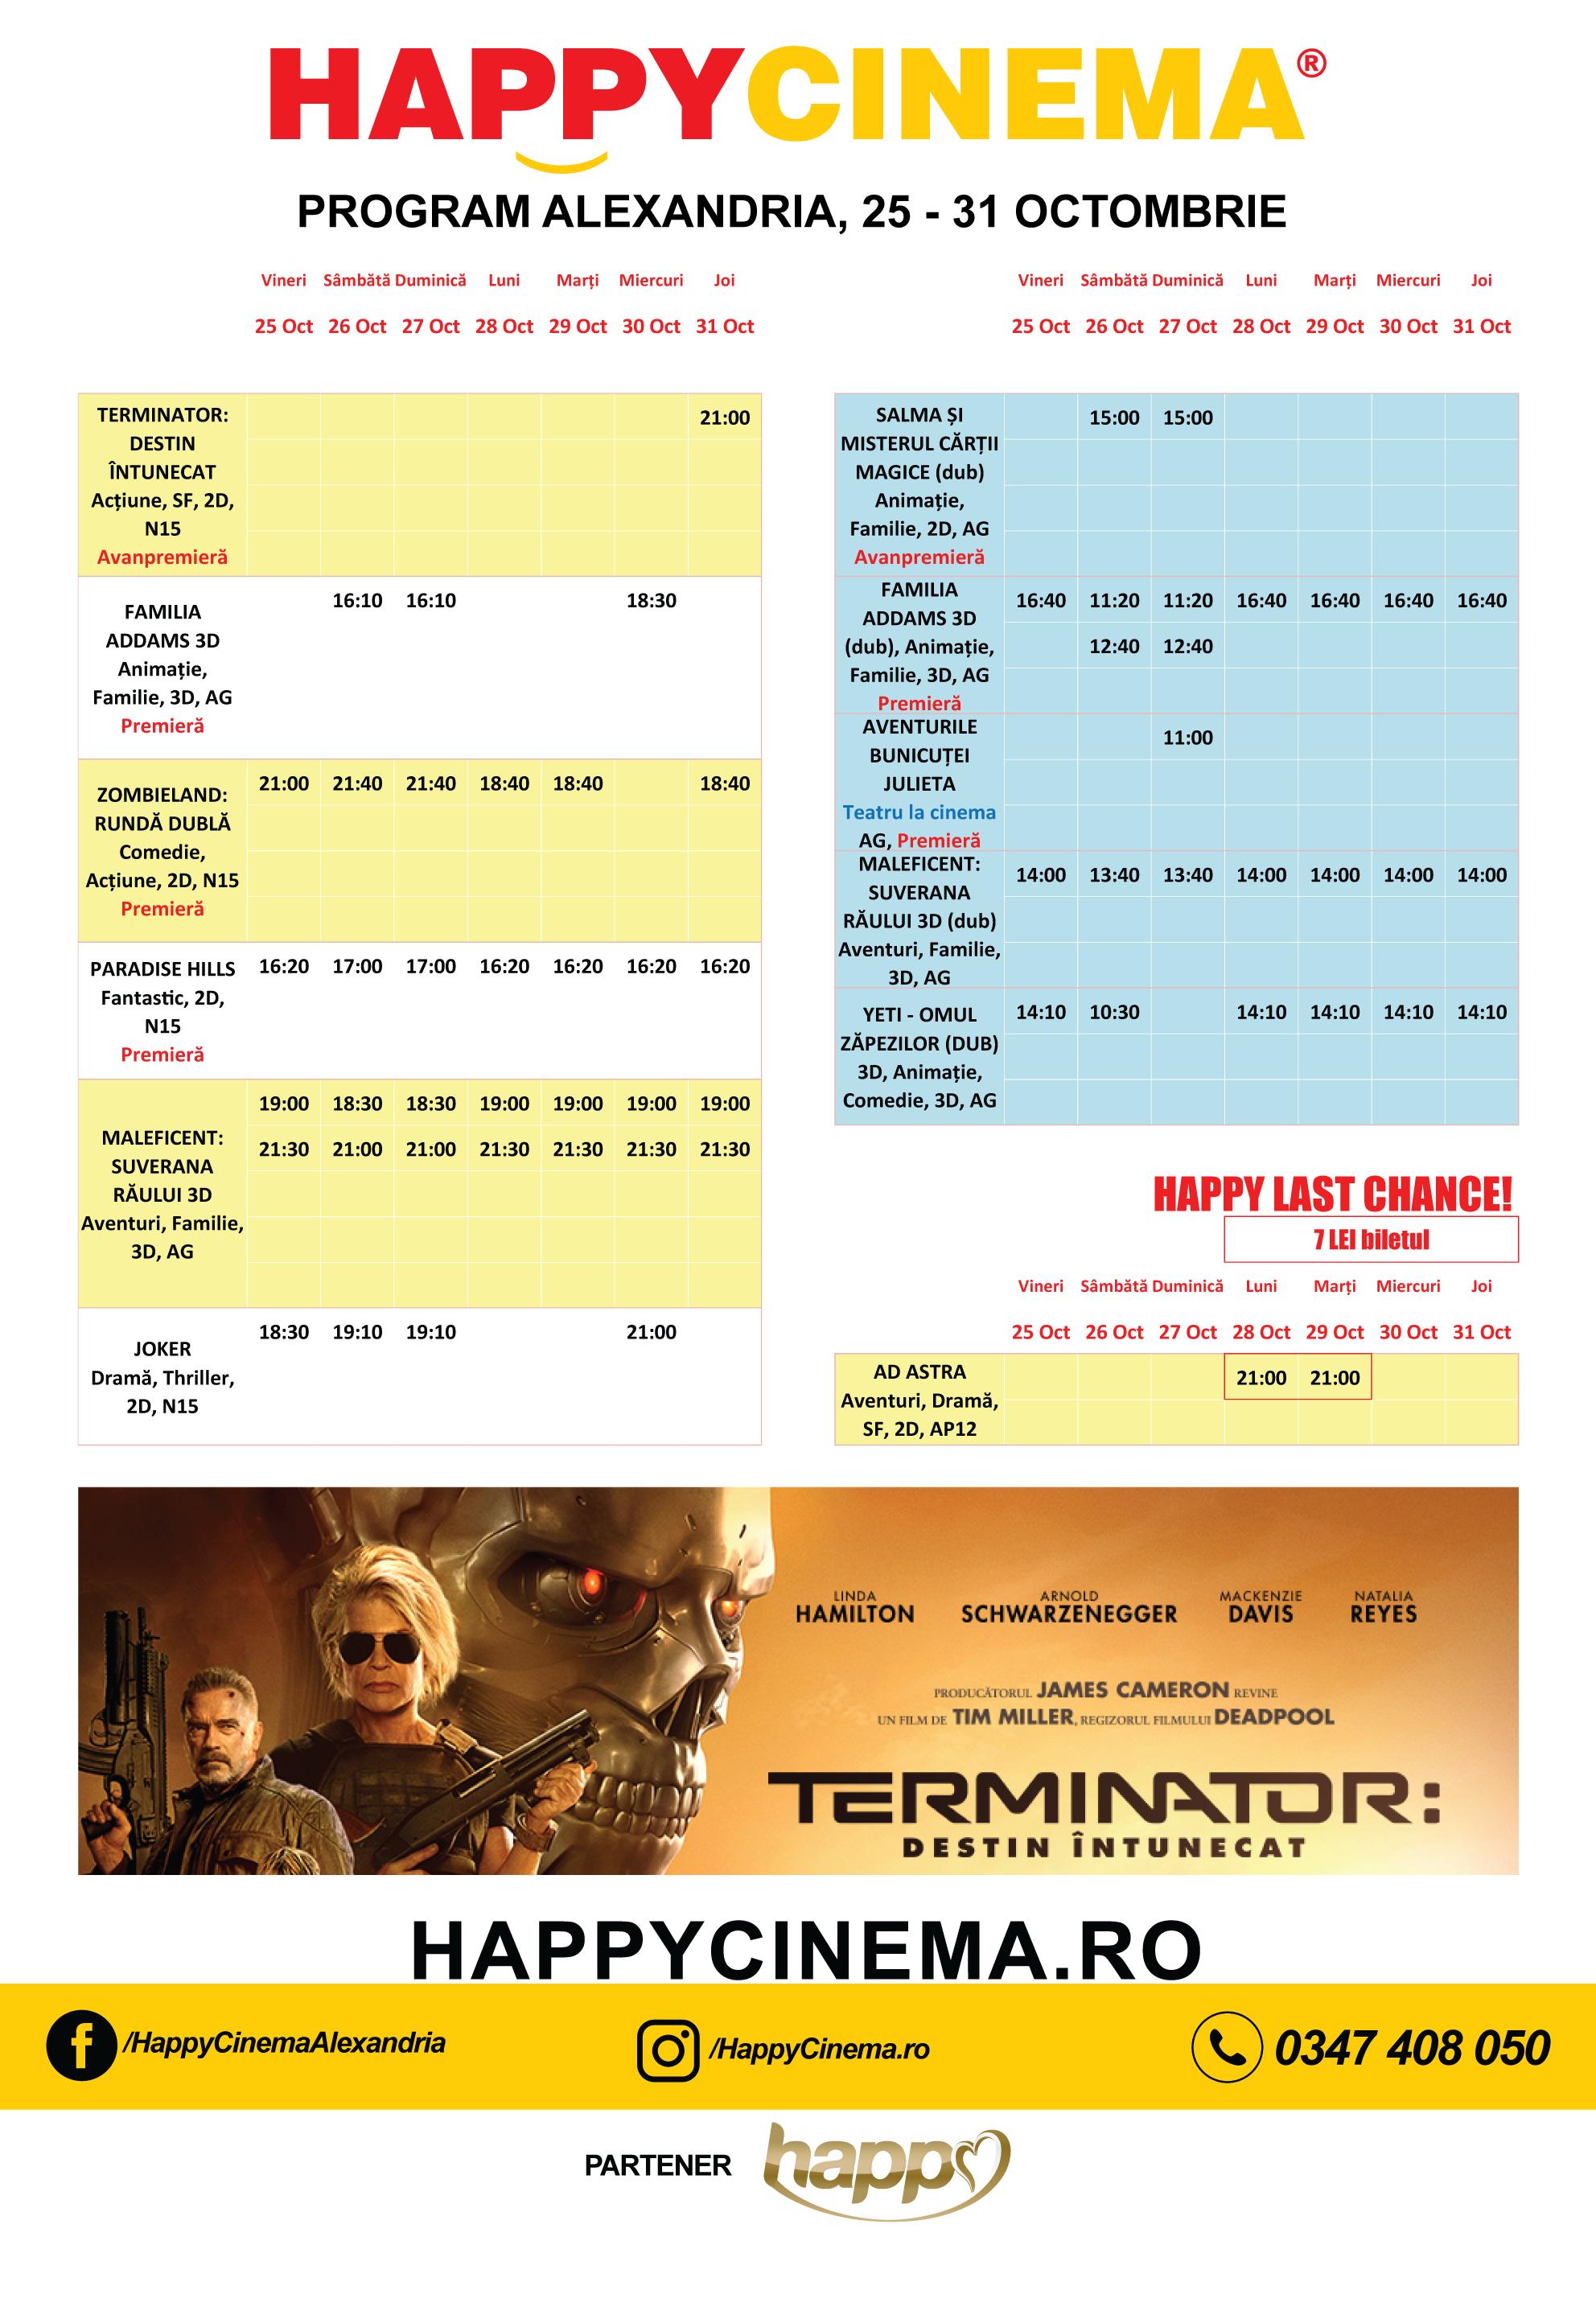 Programul filmelor la Happy Cinema Alexandria, perioada 25-31 octombrie